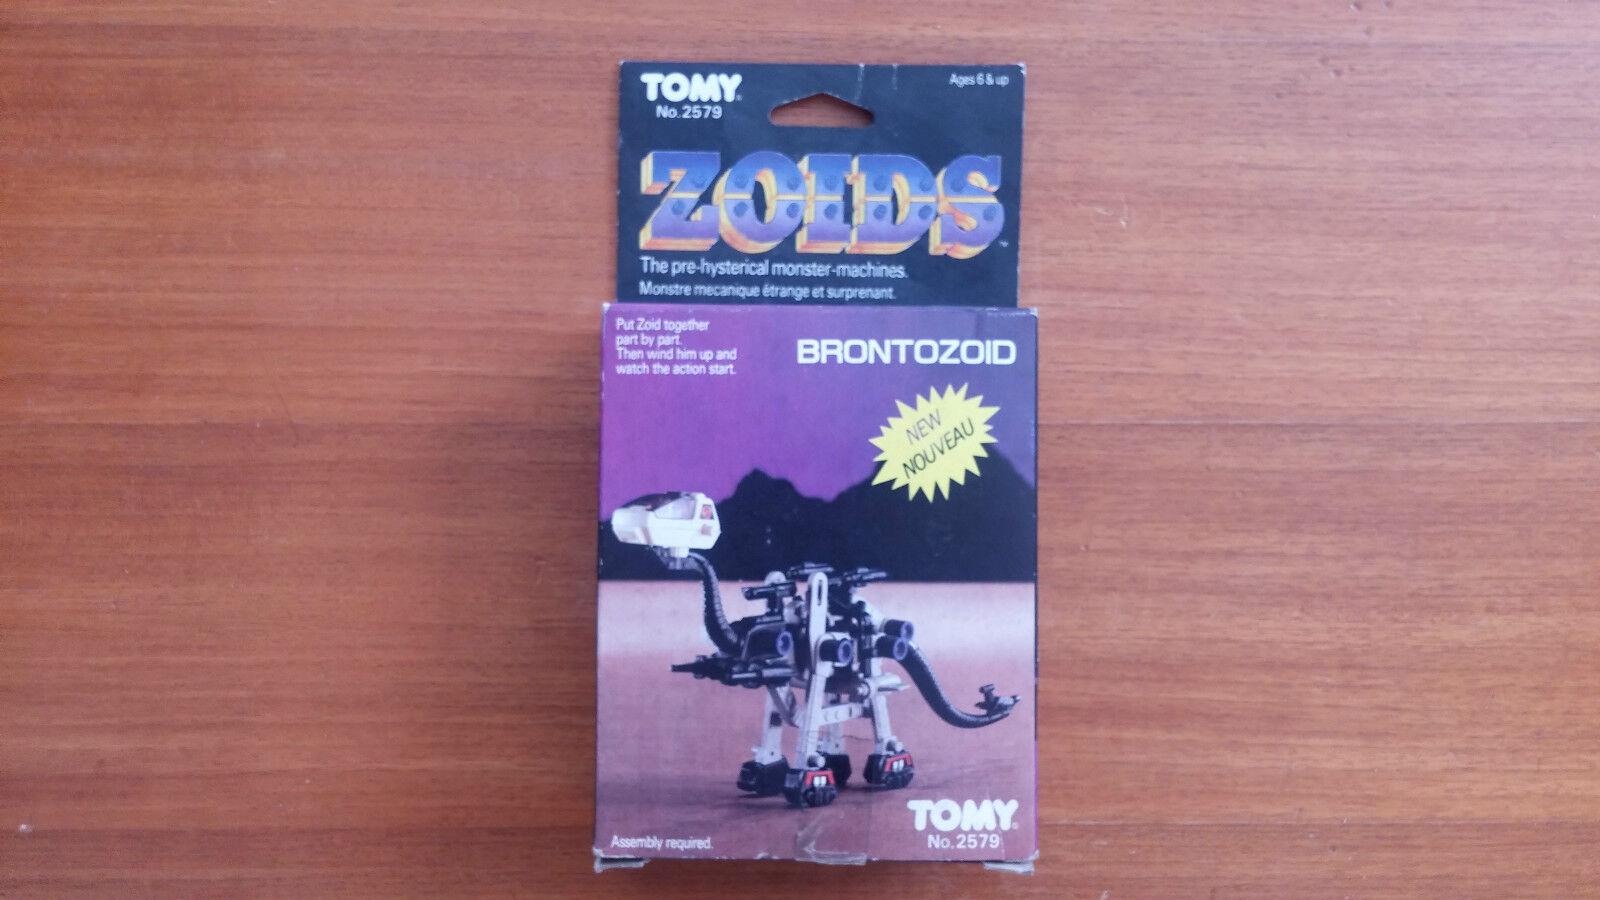 Giocattolo Vintage Zoids Brontozoid Tomy Tout nuovo Jamais scompattare